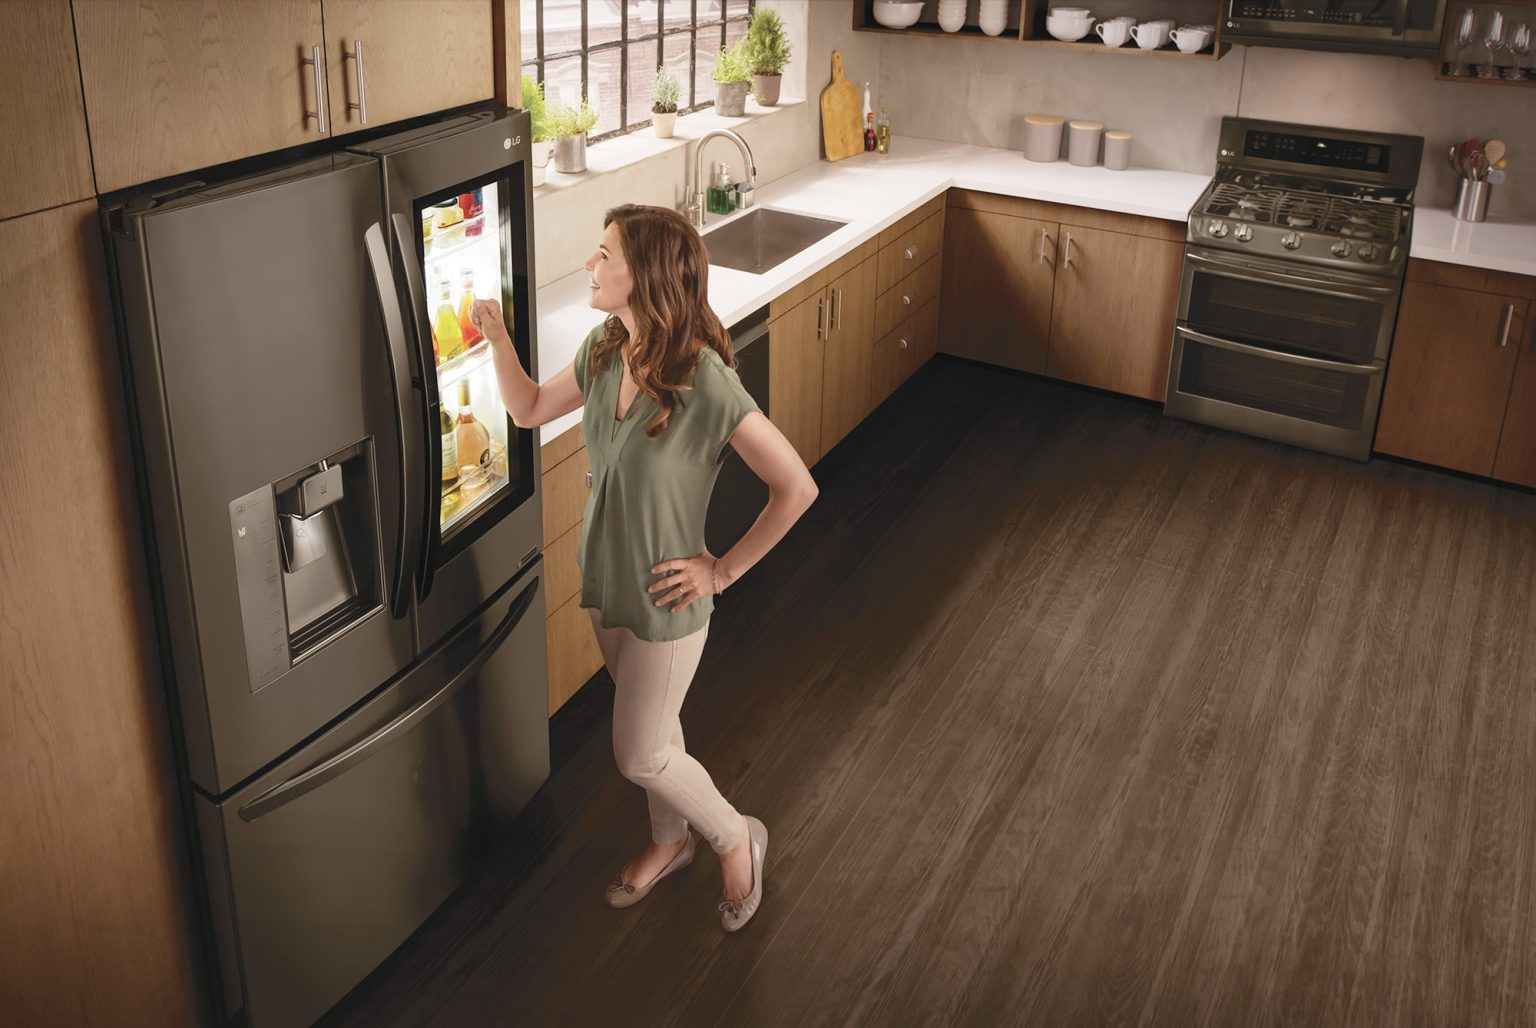 LG knock on refrigerator